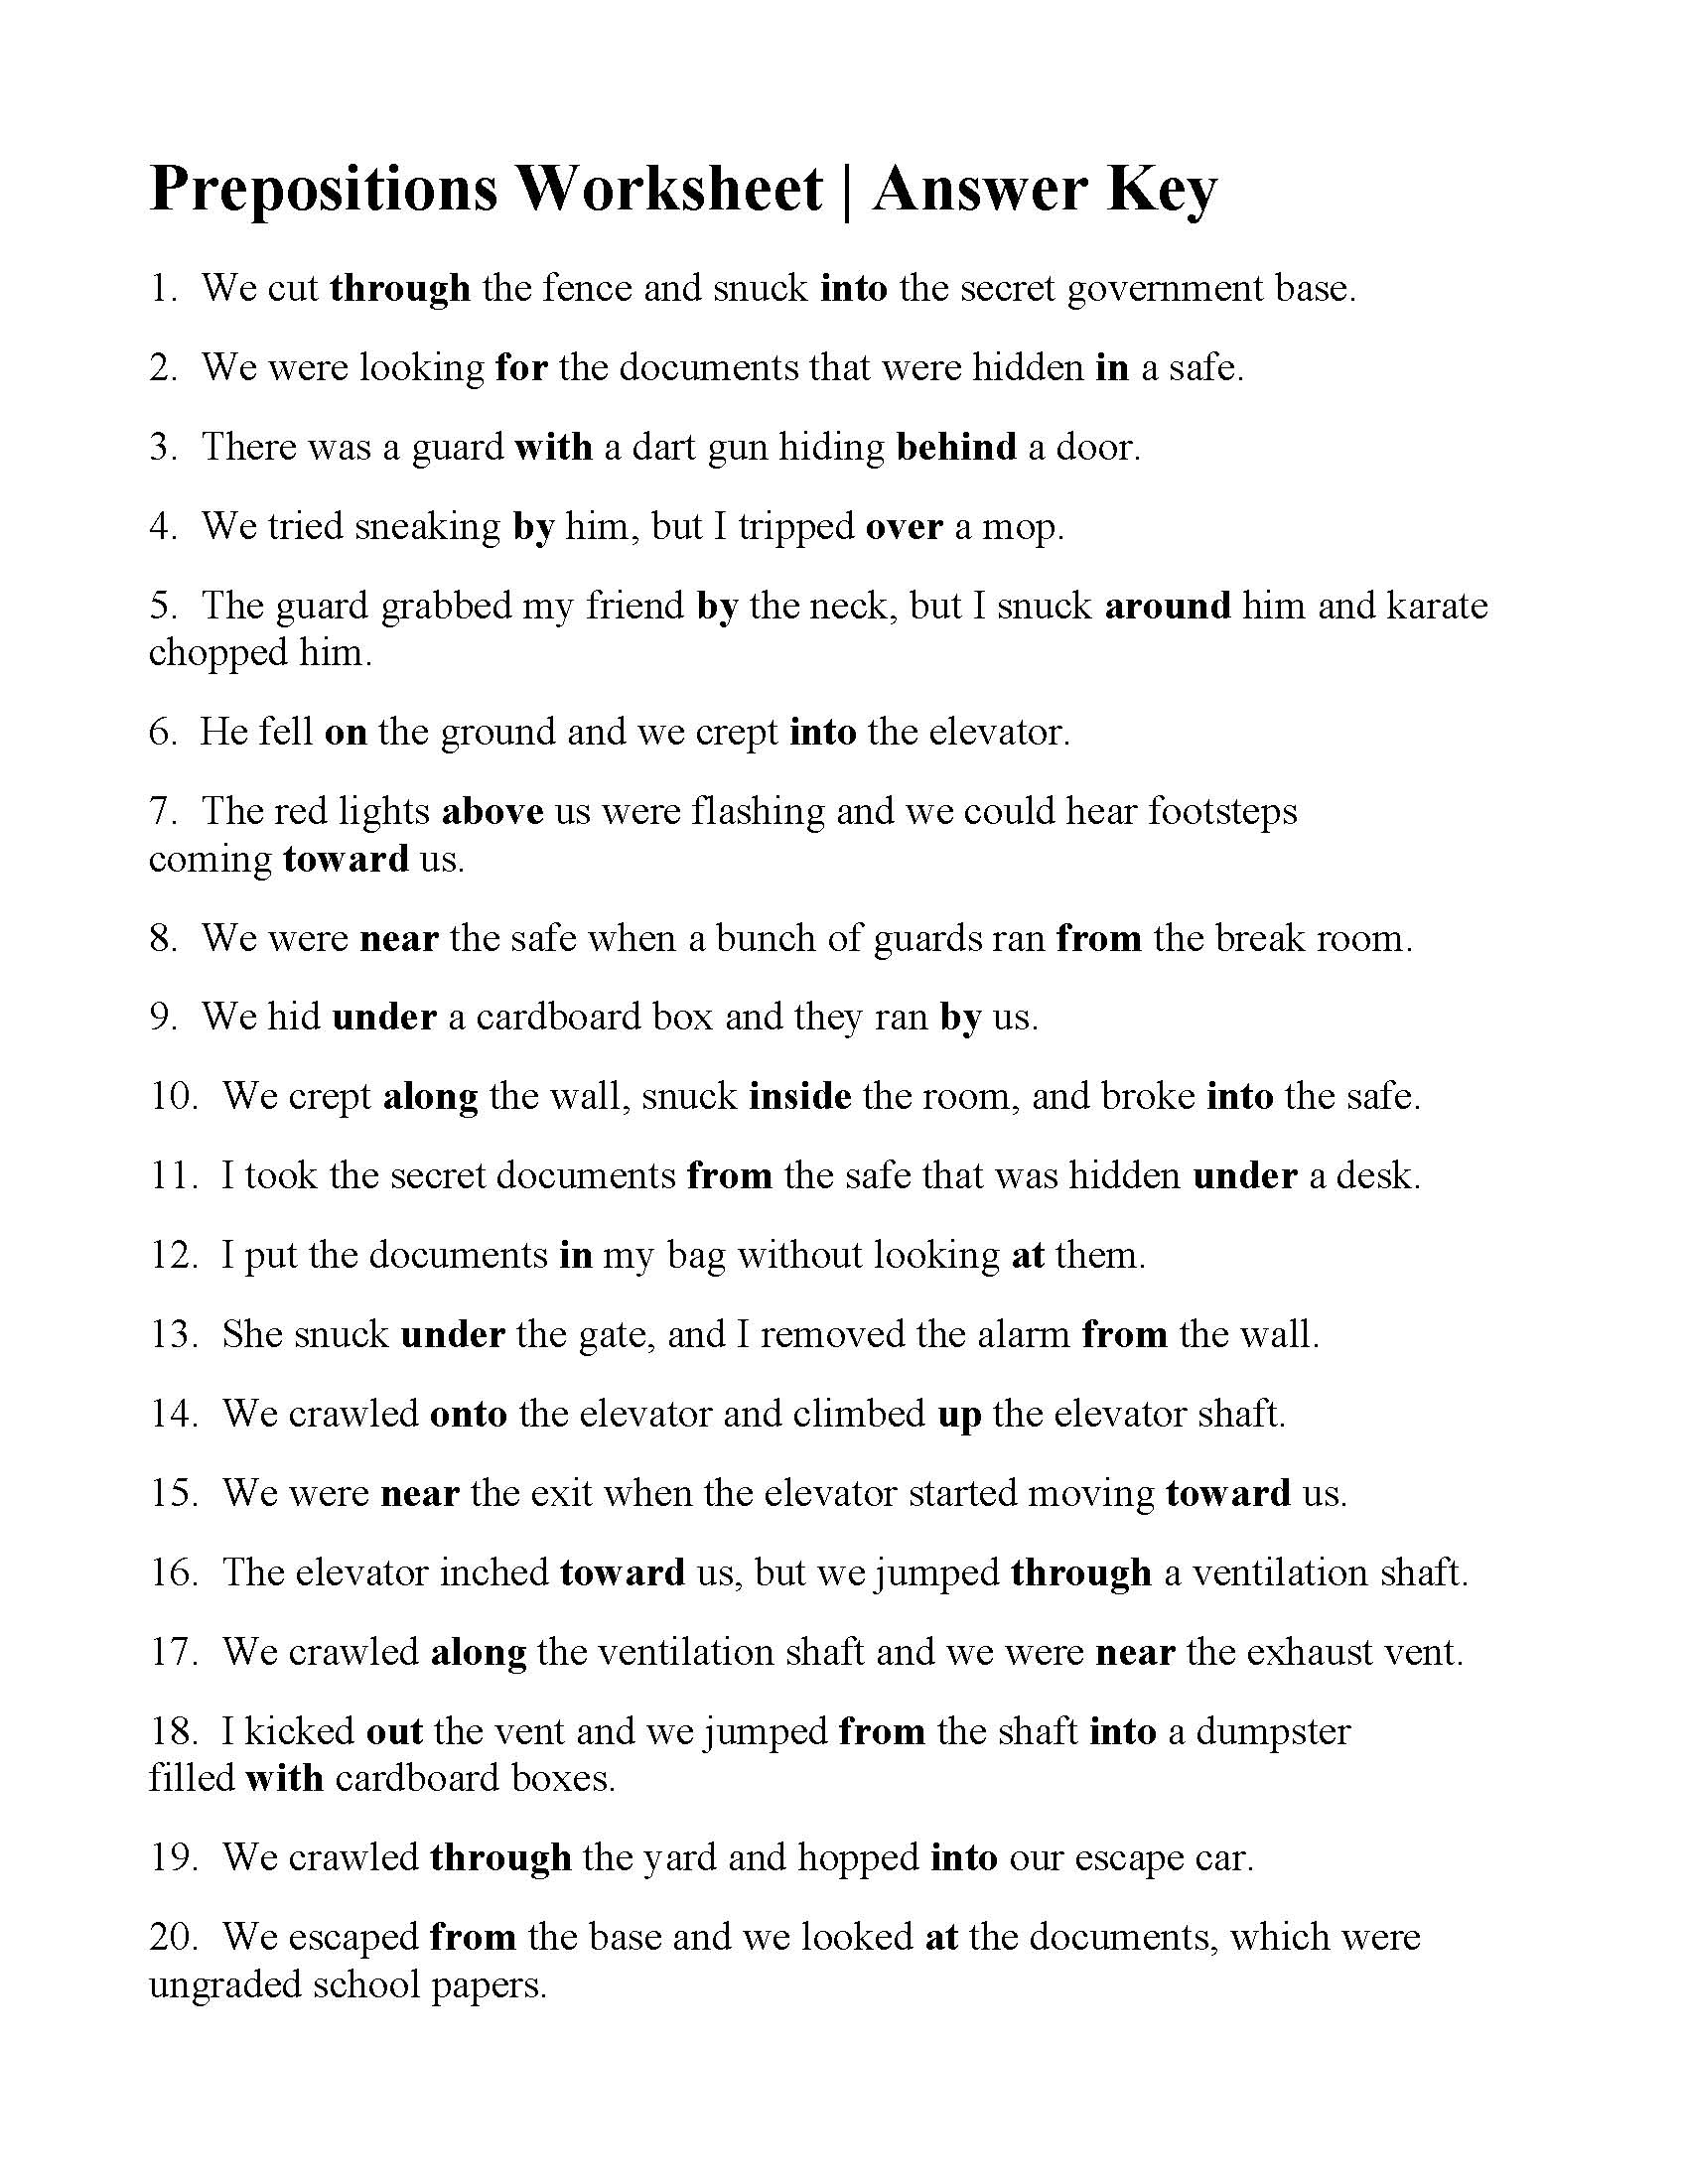 Identify The Preposition Worksheet